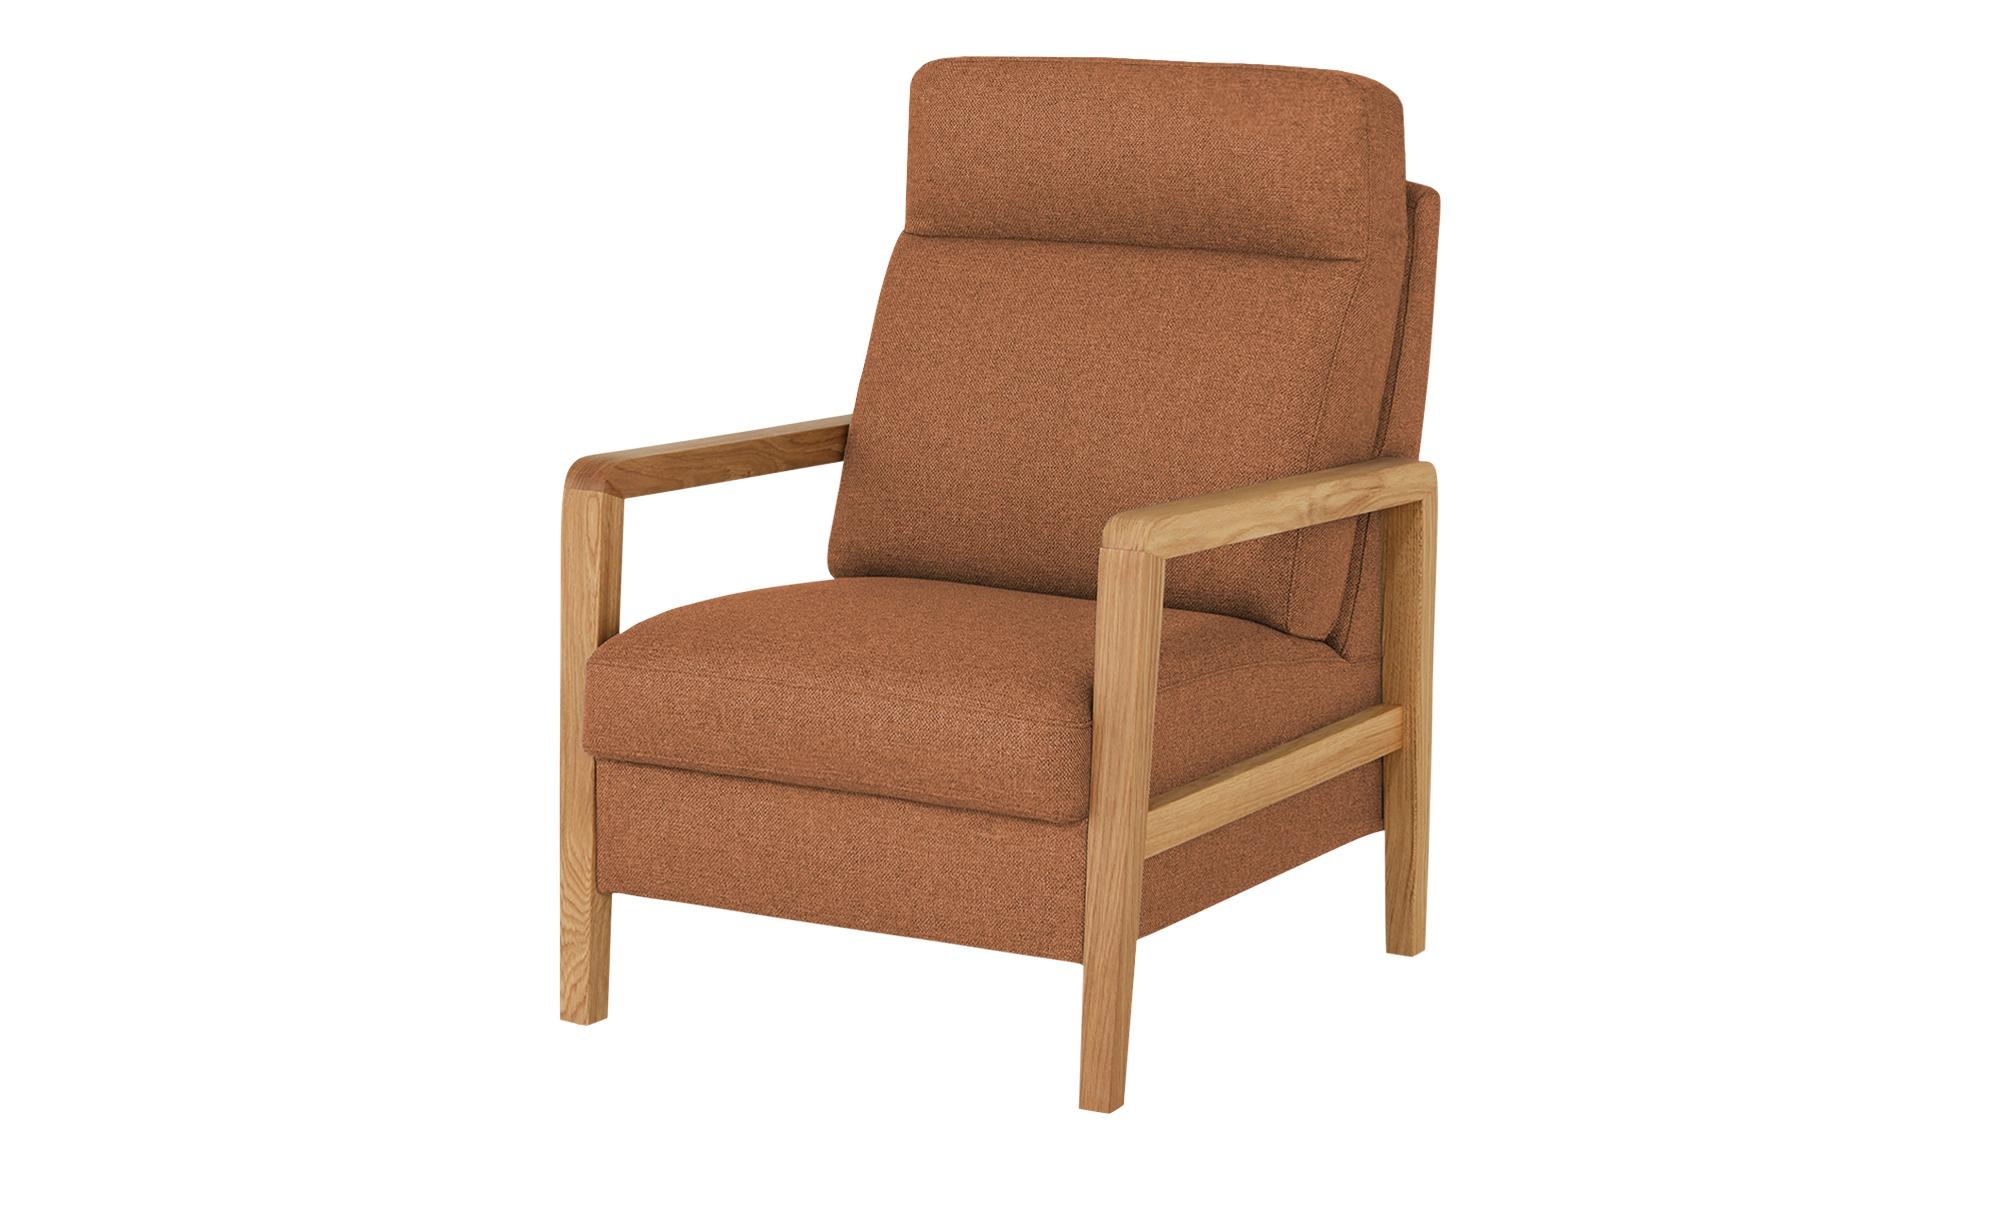 Wohnwert Sessel  Petra ¦ orange ¦ Maße (cm): B: 71 H: 103 T: 89 Polstermöbel > Sessel > Polstersessel - Höffner